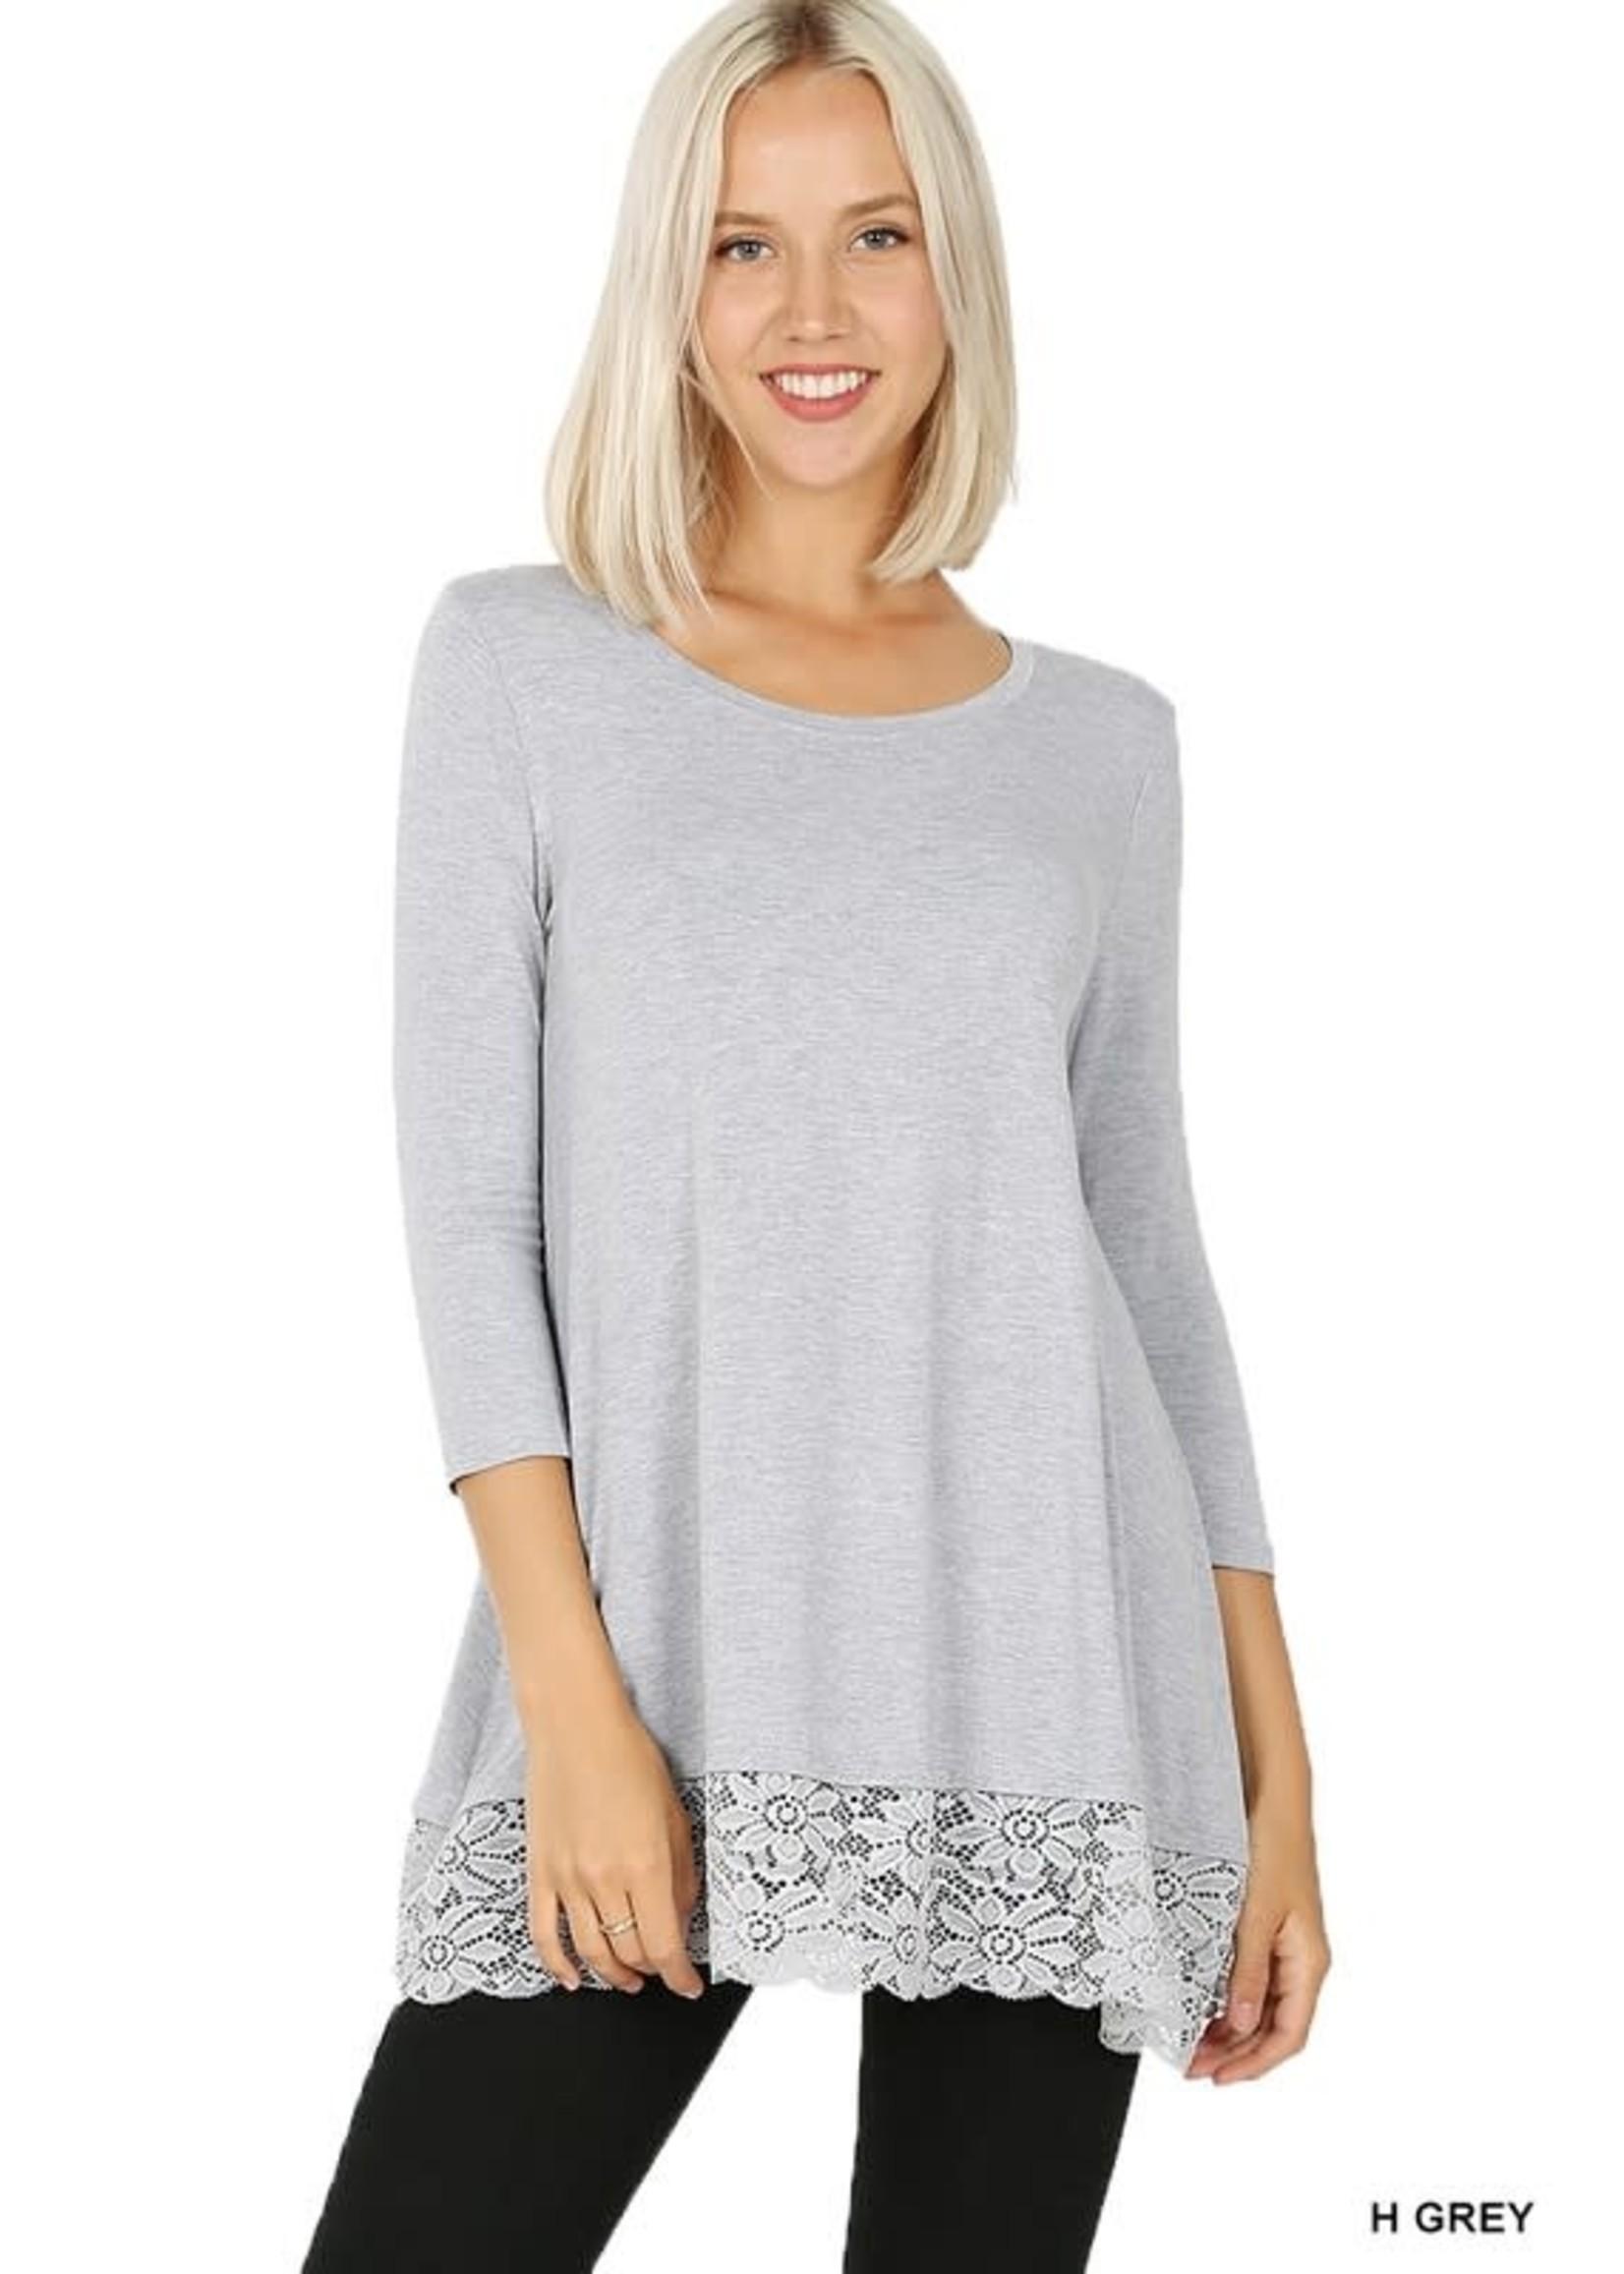 Zenana 3/4 Sleeve Lace Trim Hem Tunic Top